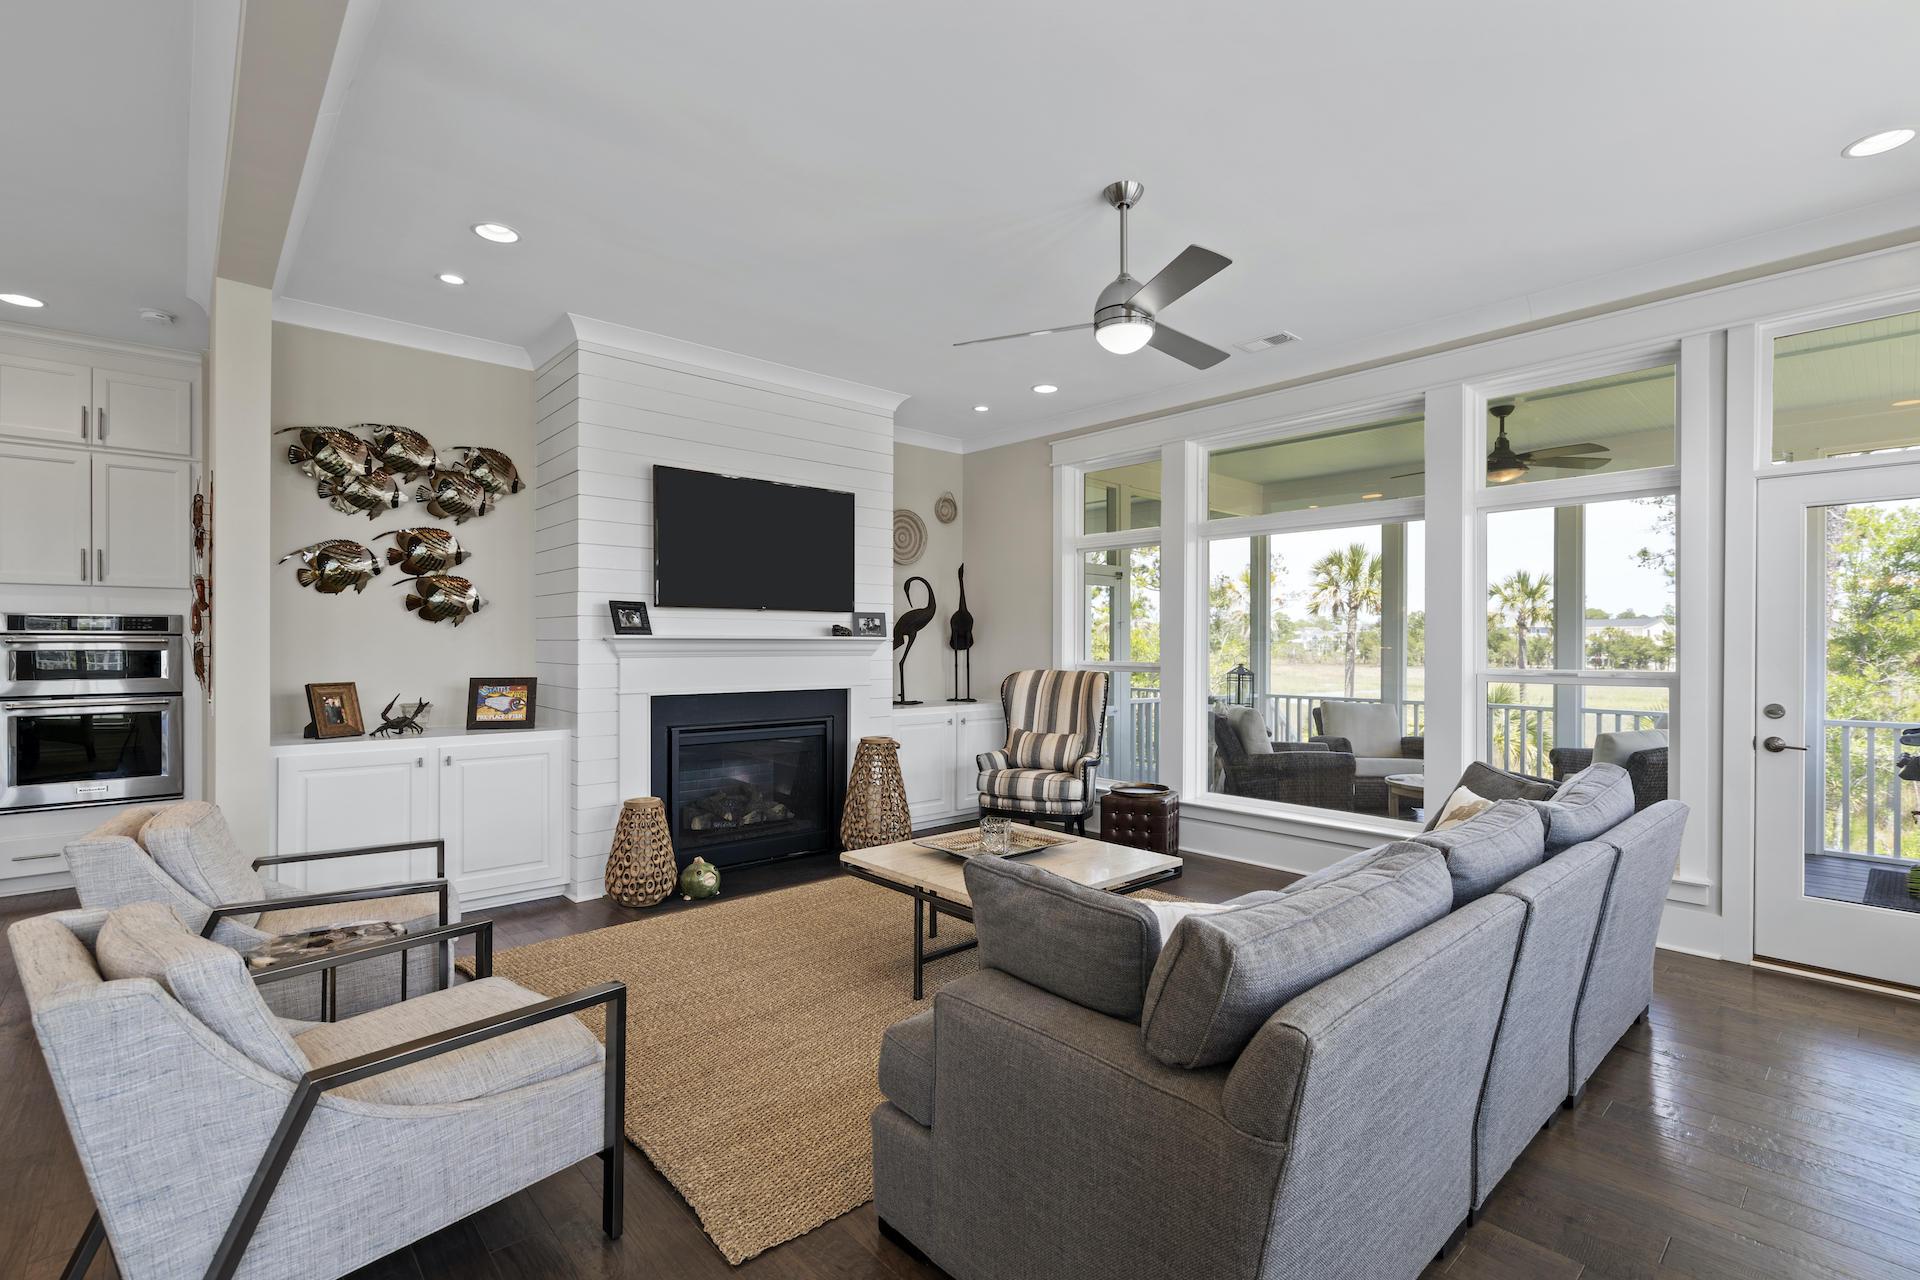 Dunes West Homes For Sale - 2316 Bucktail, Mount Pleasant, SC - 35